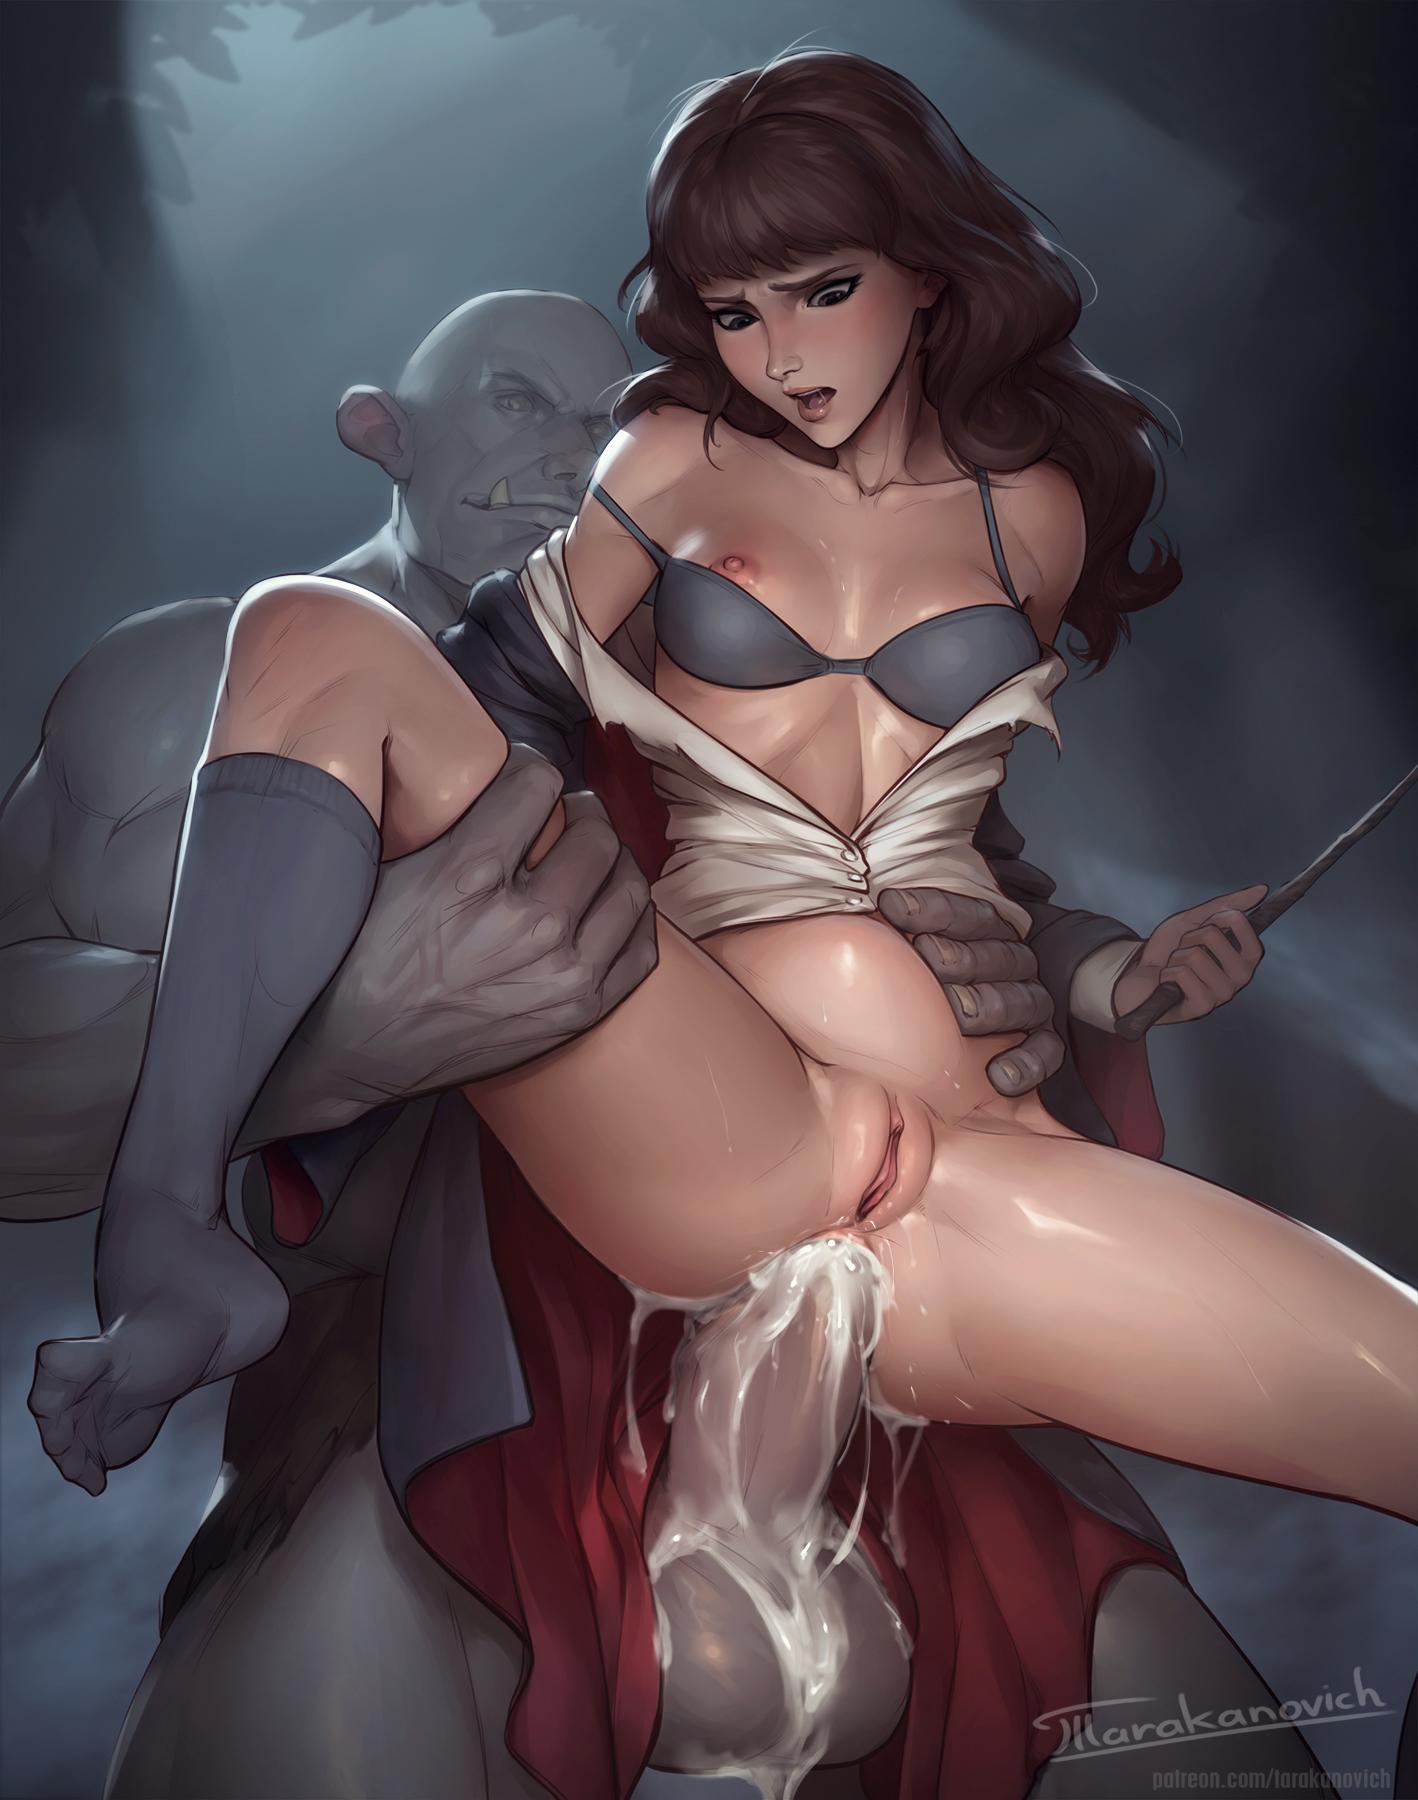 naked girls trapped in a sauna Anal, Anime, Bra, Breasts, Bulge, Cum, Harrypotter, Hentai, Hermione, Tarakanovich, Teen, Underwear